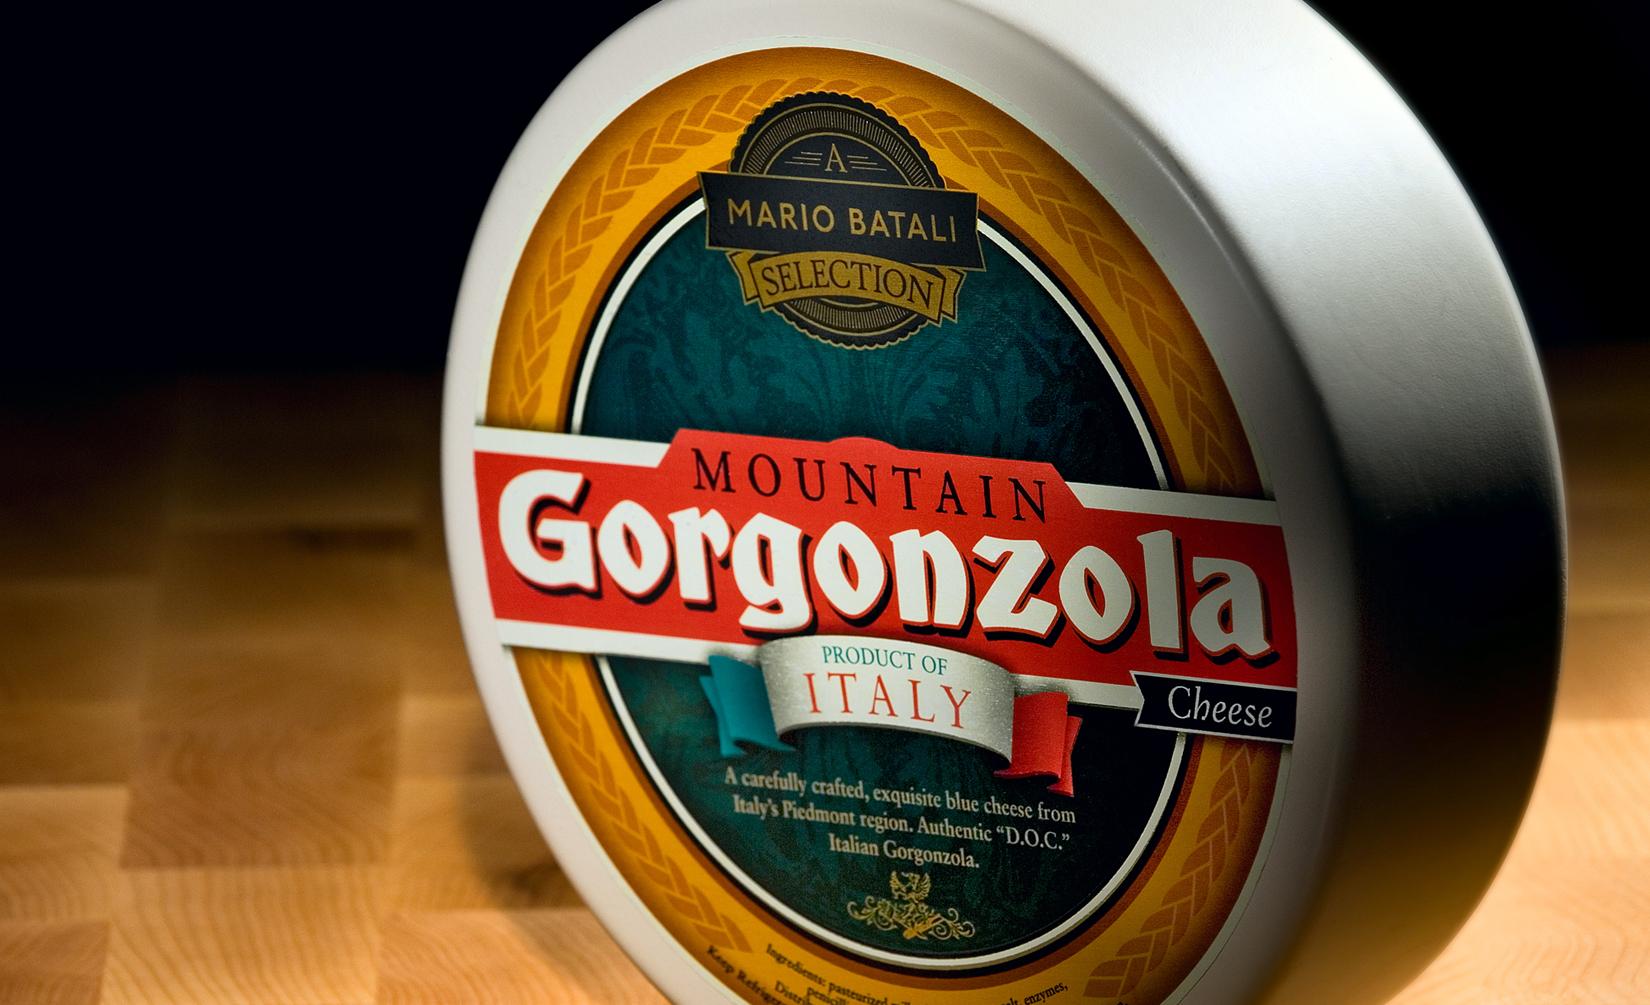 Gorgonzola Cheese Product Label